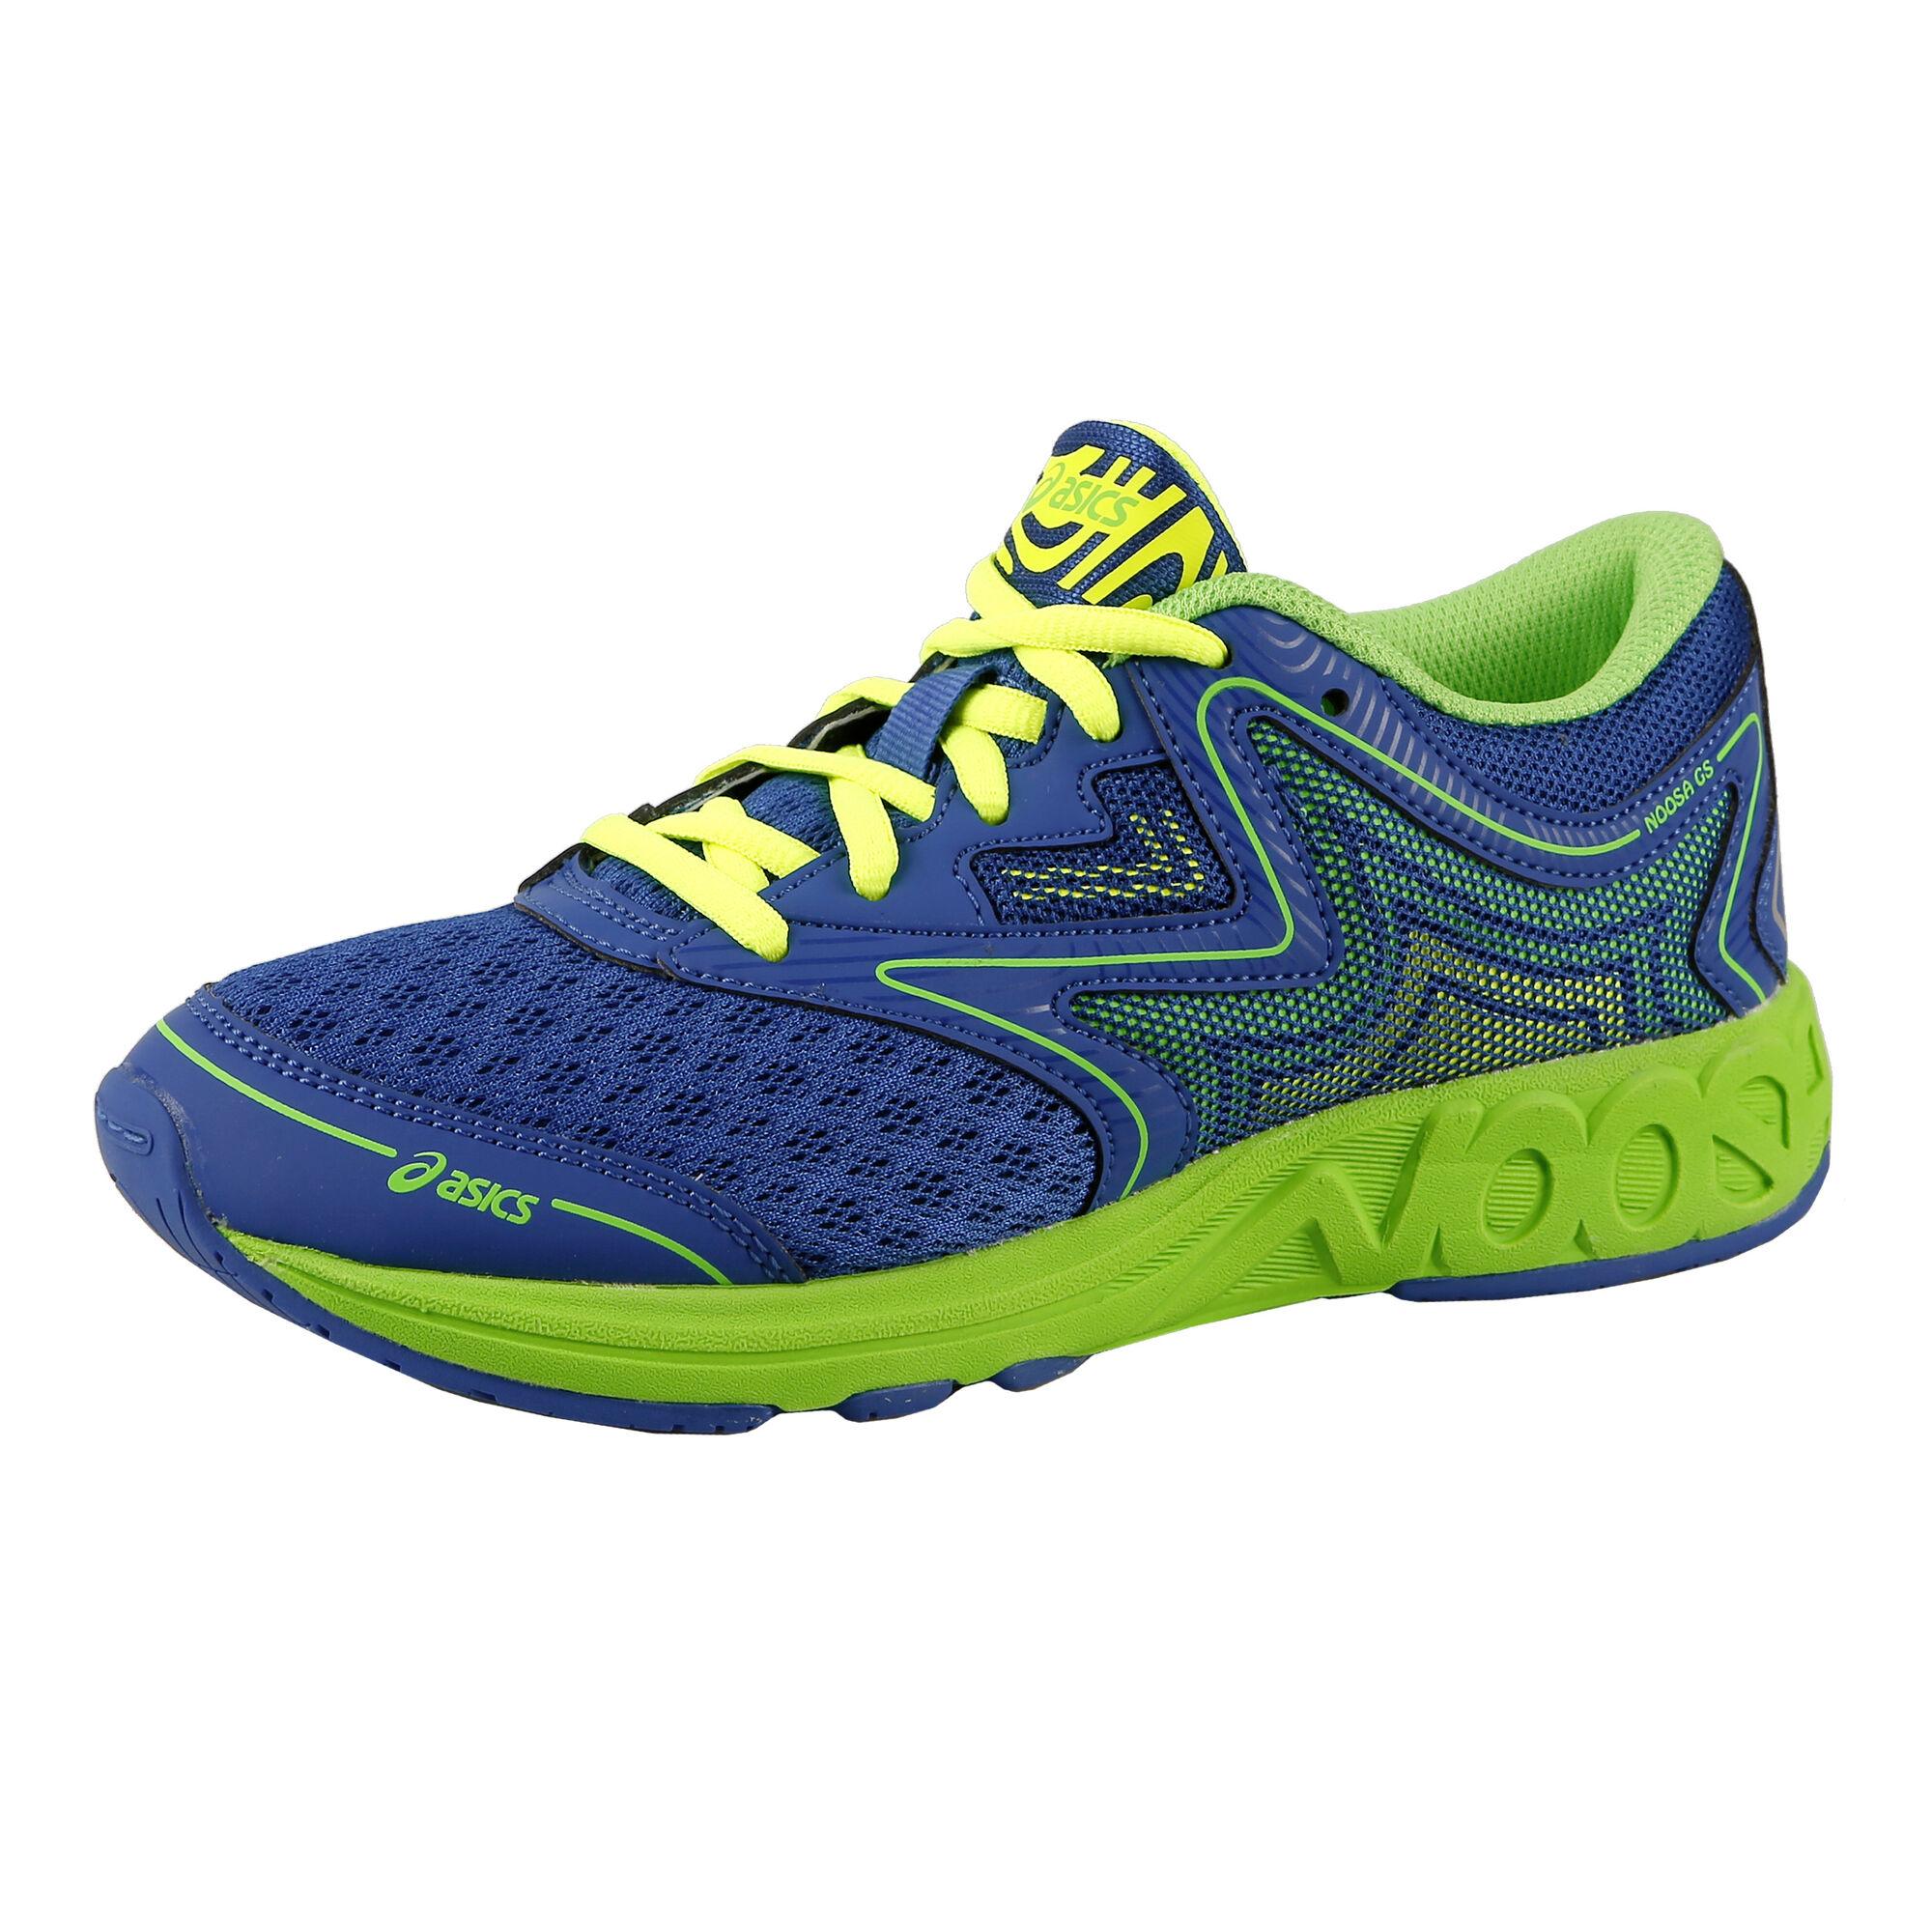 449ad140fd5b buy Asics Gel-Noosa FF GS Competition Running Shoe Kids - Blue ...